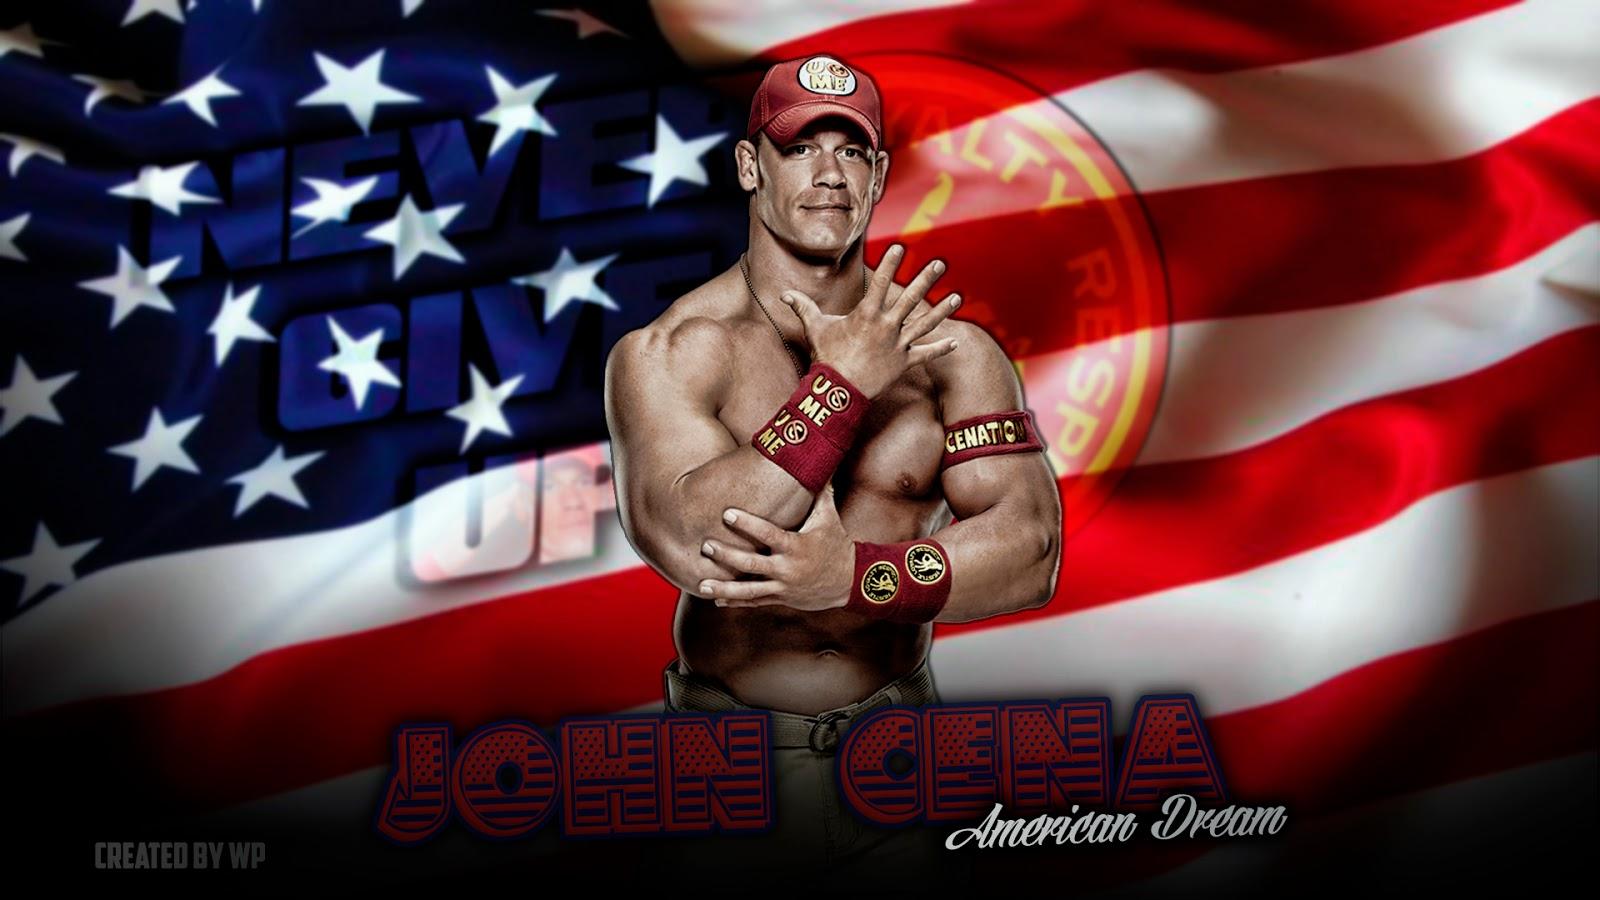 John Cena Wallpapers 2014 Very Good